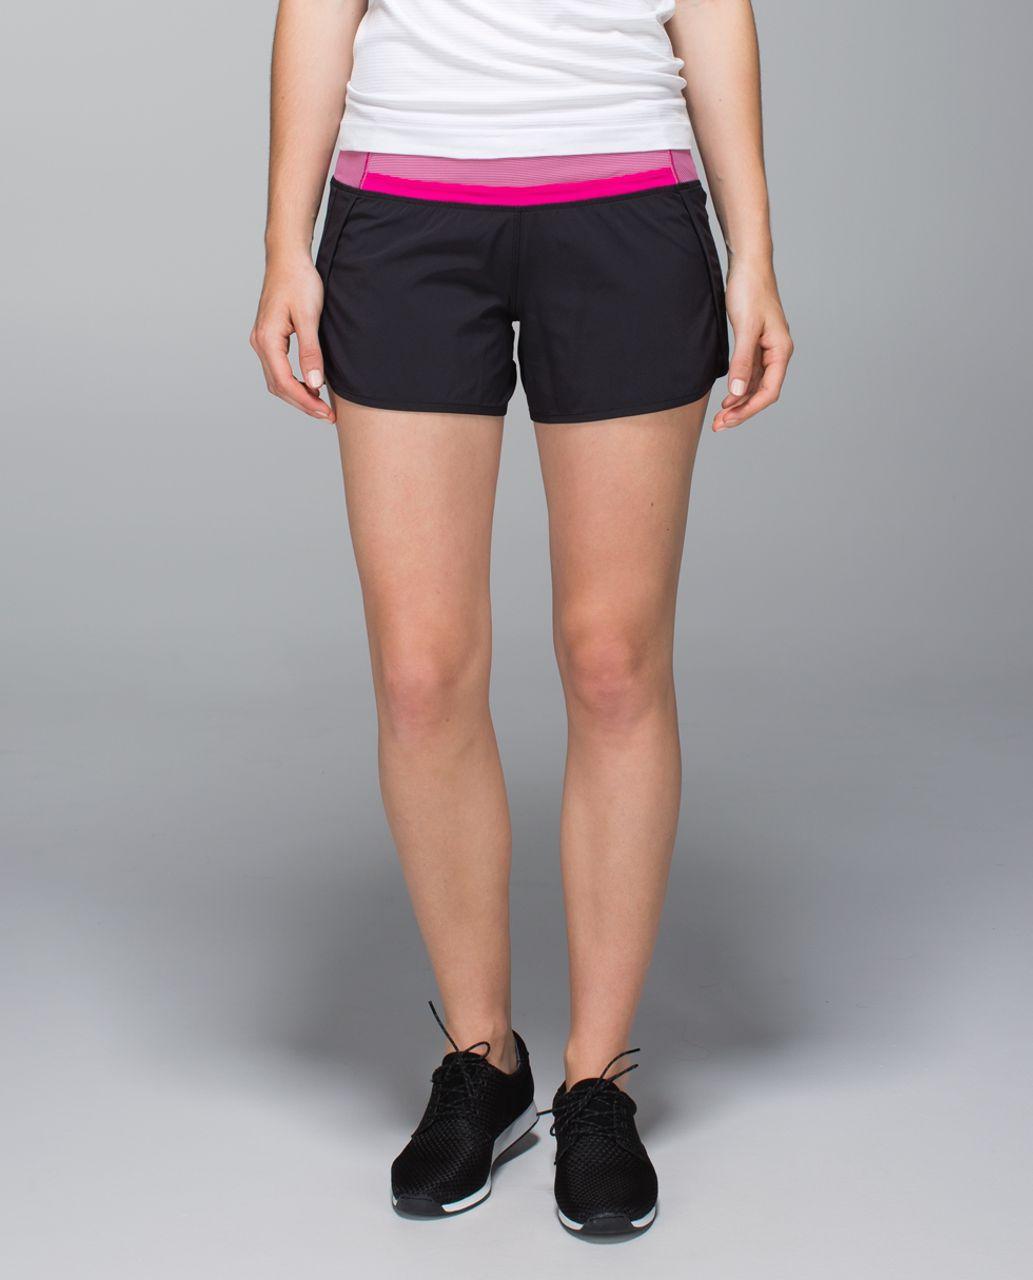 Lululemon Run Times Short *4-way stretch - Black / Wee Stripe Jewelled Magenta / Jewelled Magenta